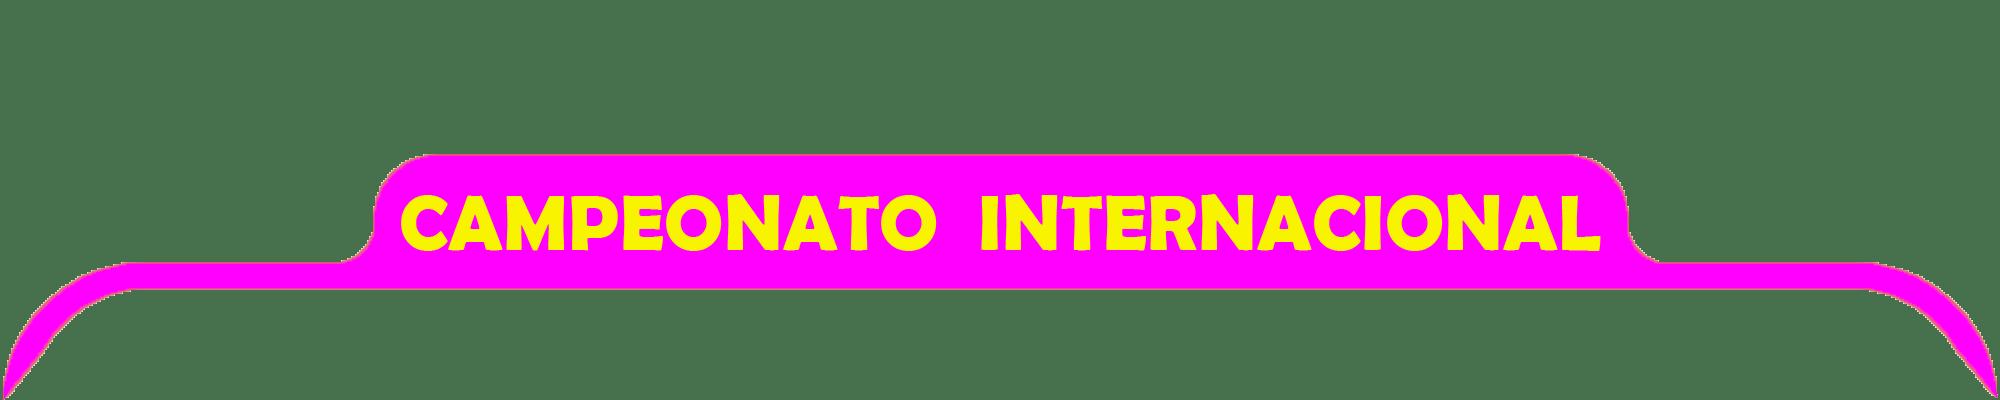 Campeonato Internacional